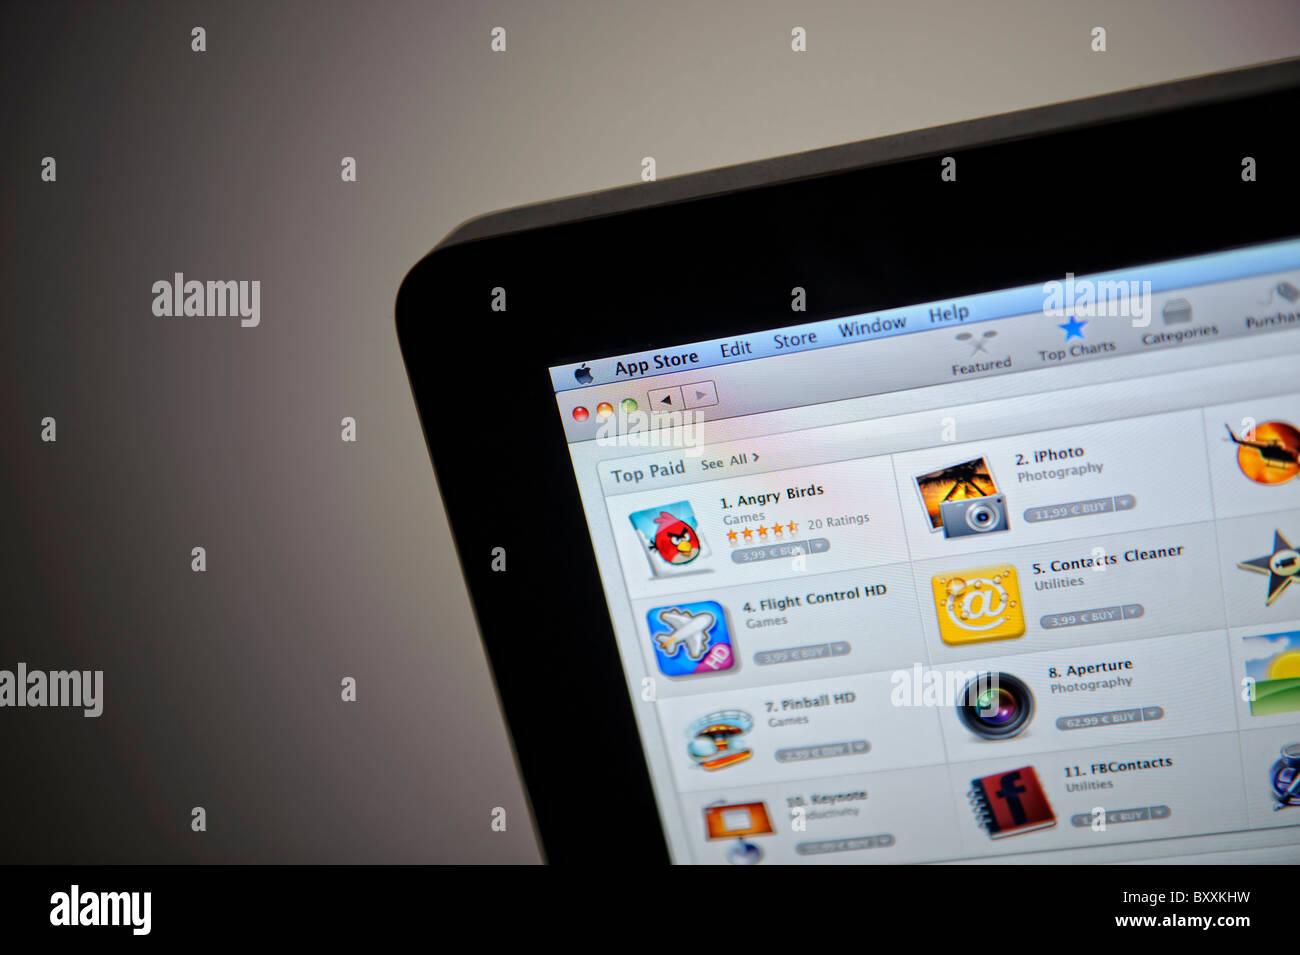 Apple Mac App Store Stock Photo: 33777573 - Alamy